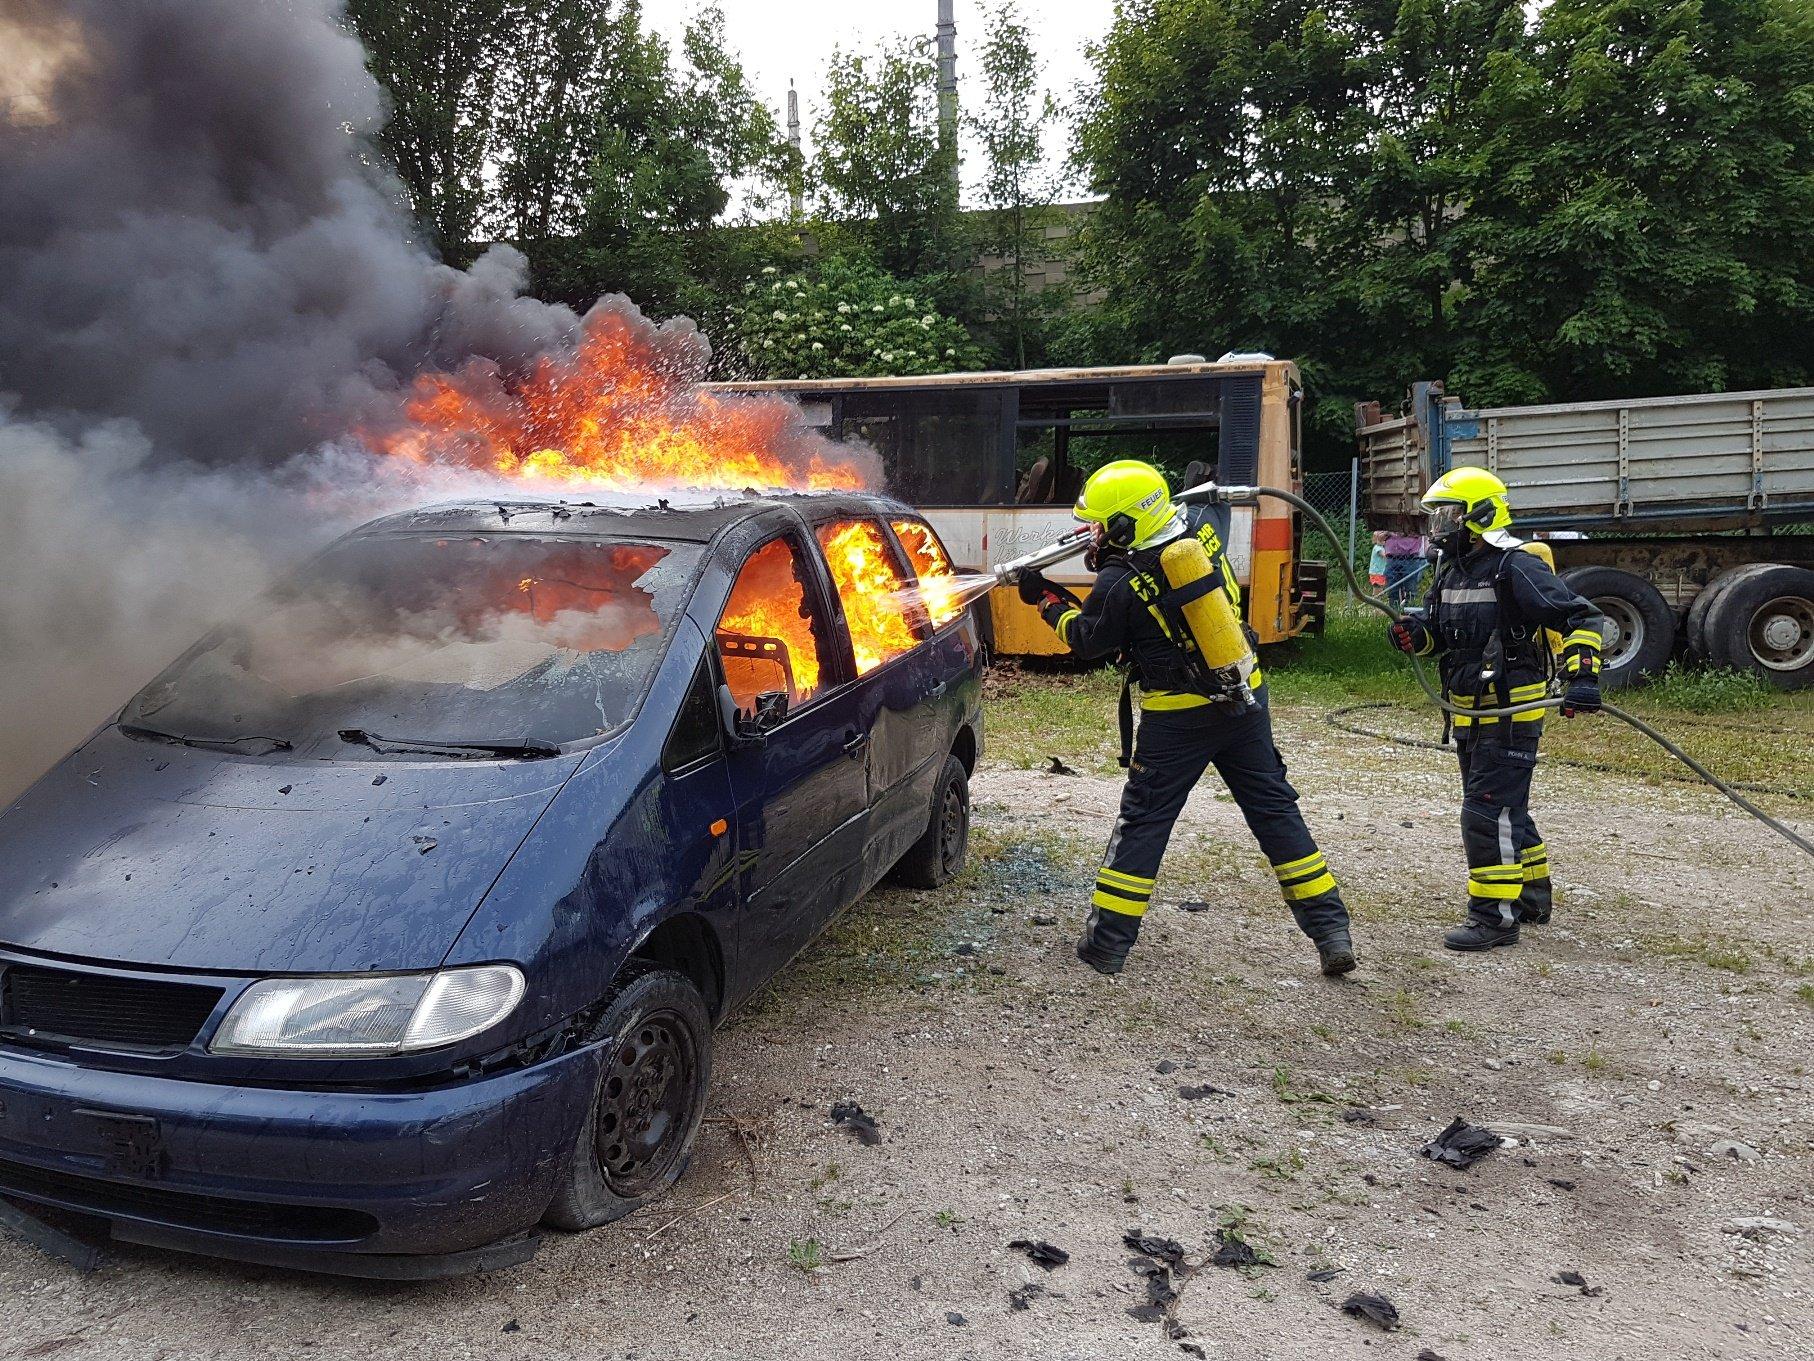 uebungpkwbrand 17 - Ölspur Wartenburger Straße